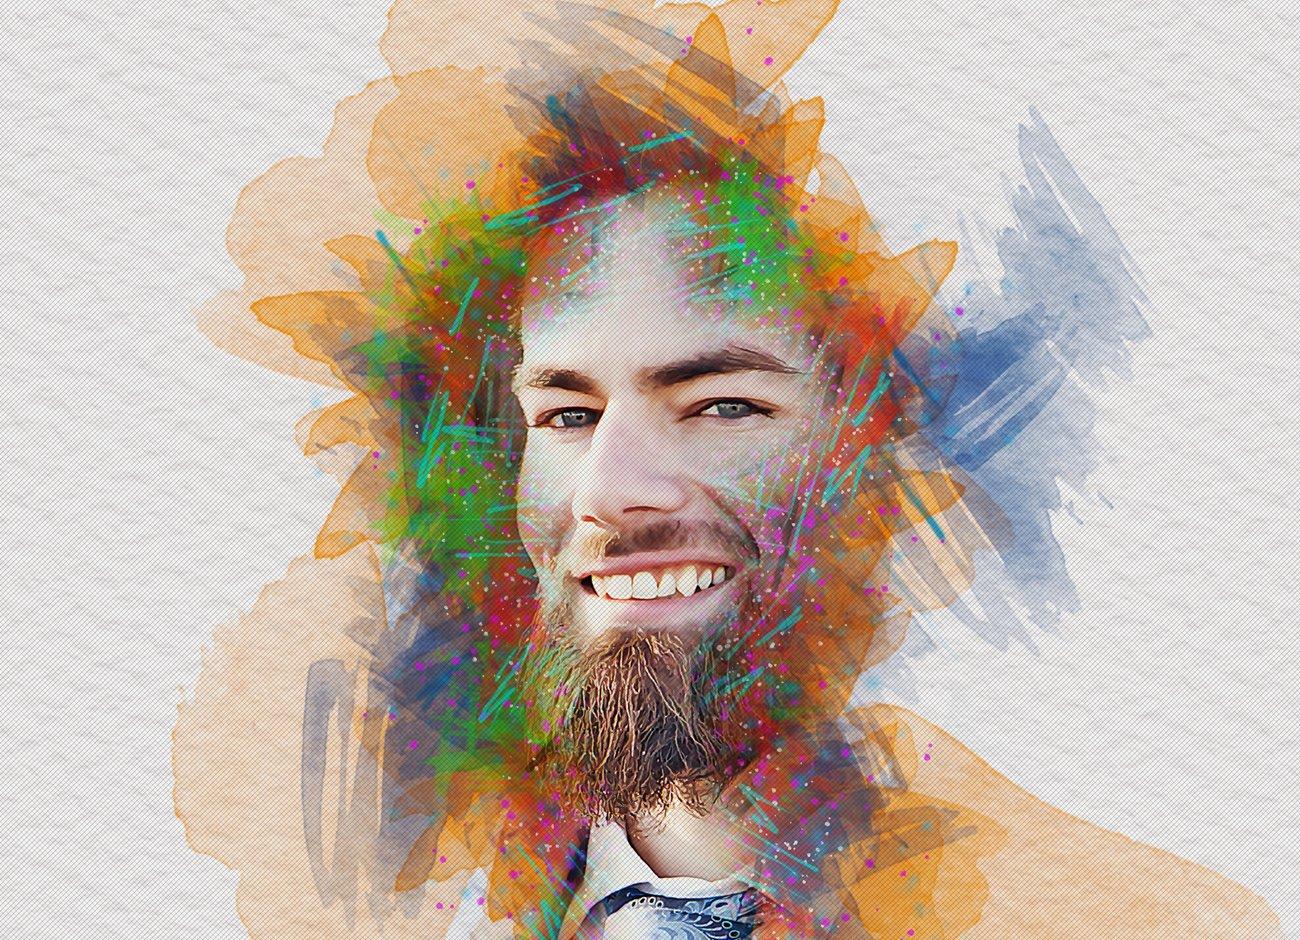 逼真水彩画效果照片处理特效PS动作模板 Watercolor Photoshop Action插图7